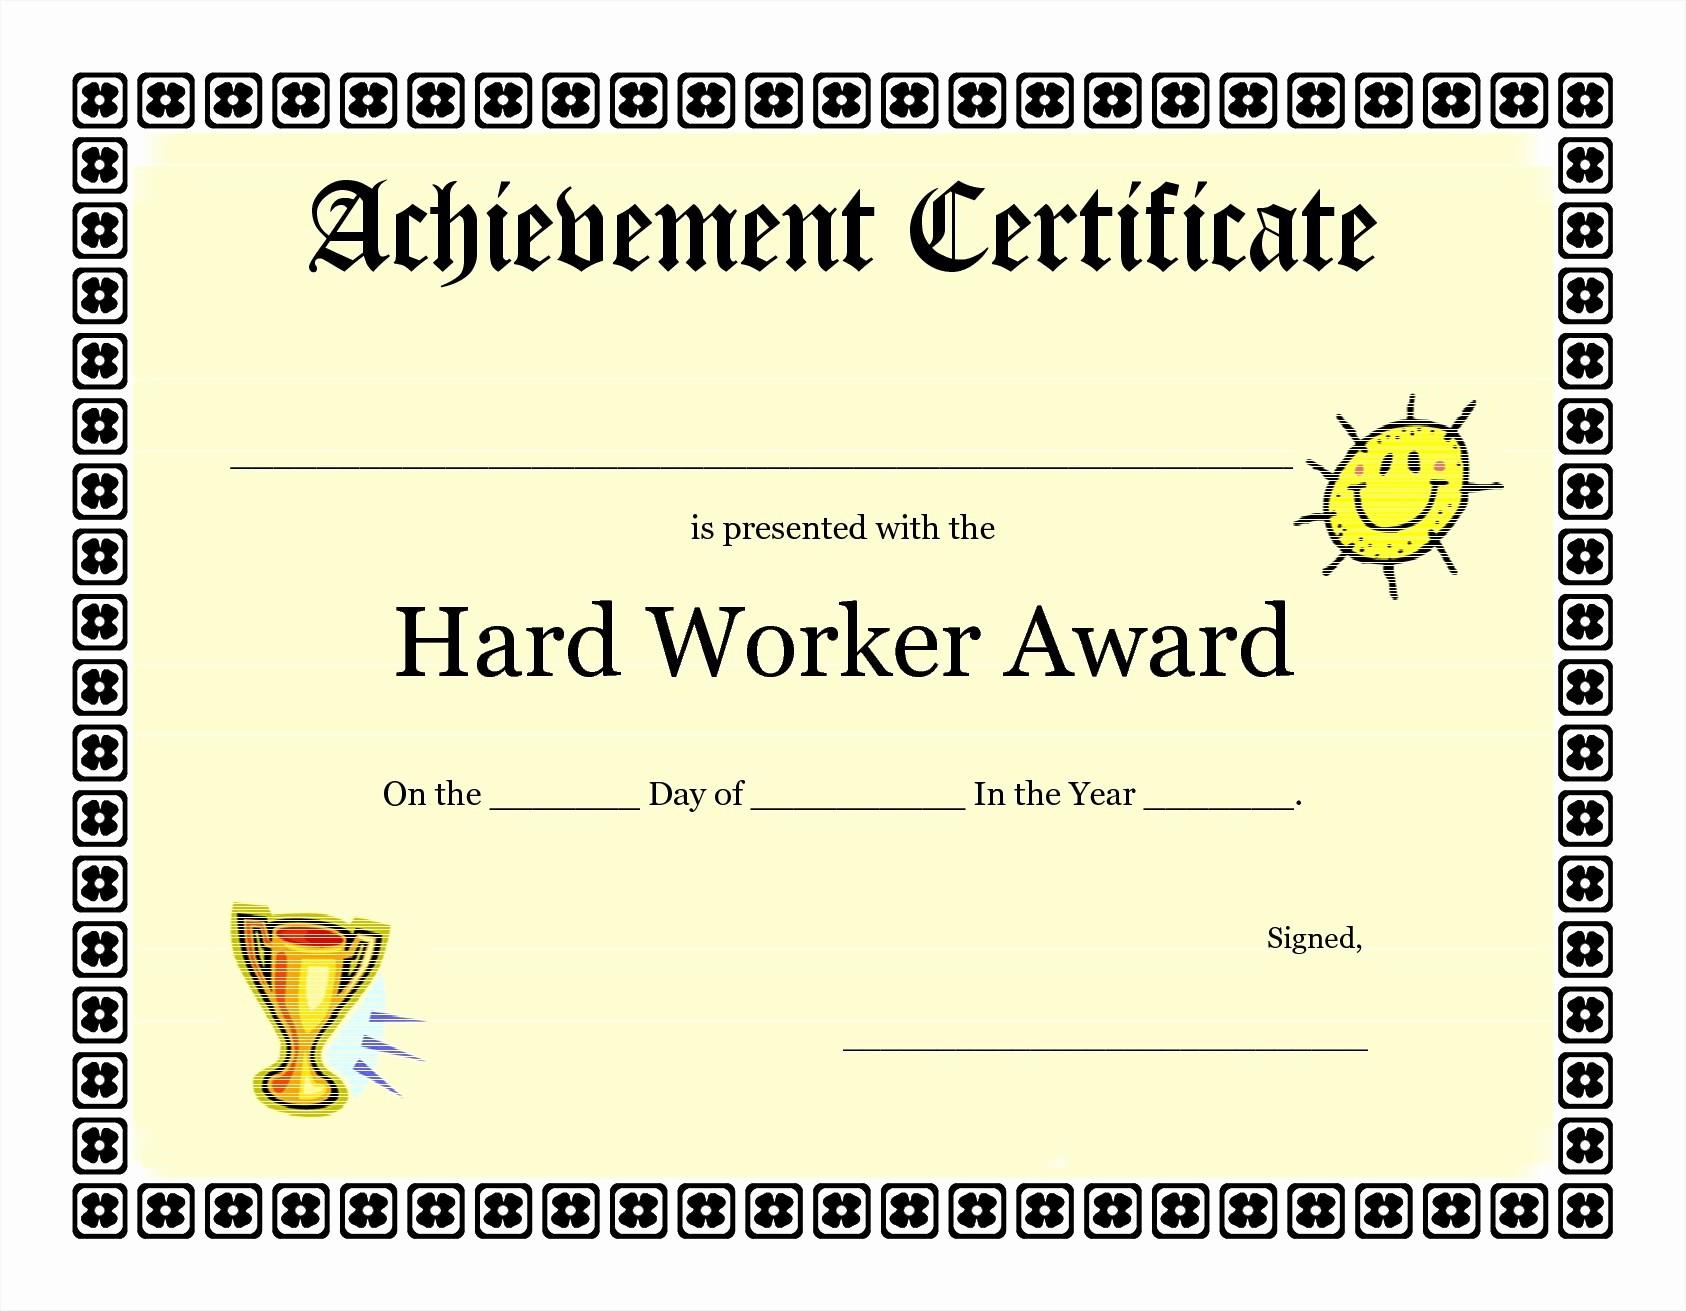 Blank Certificate Of Achievement Template Luxury Achievement Certificate Templates Free Mughals